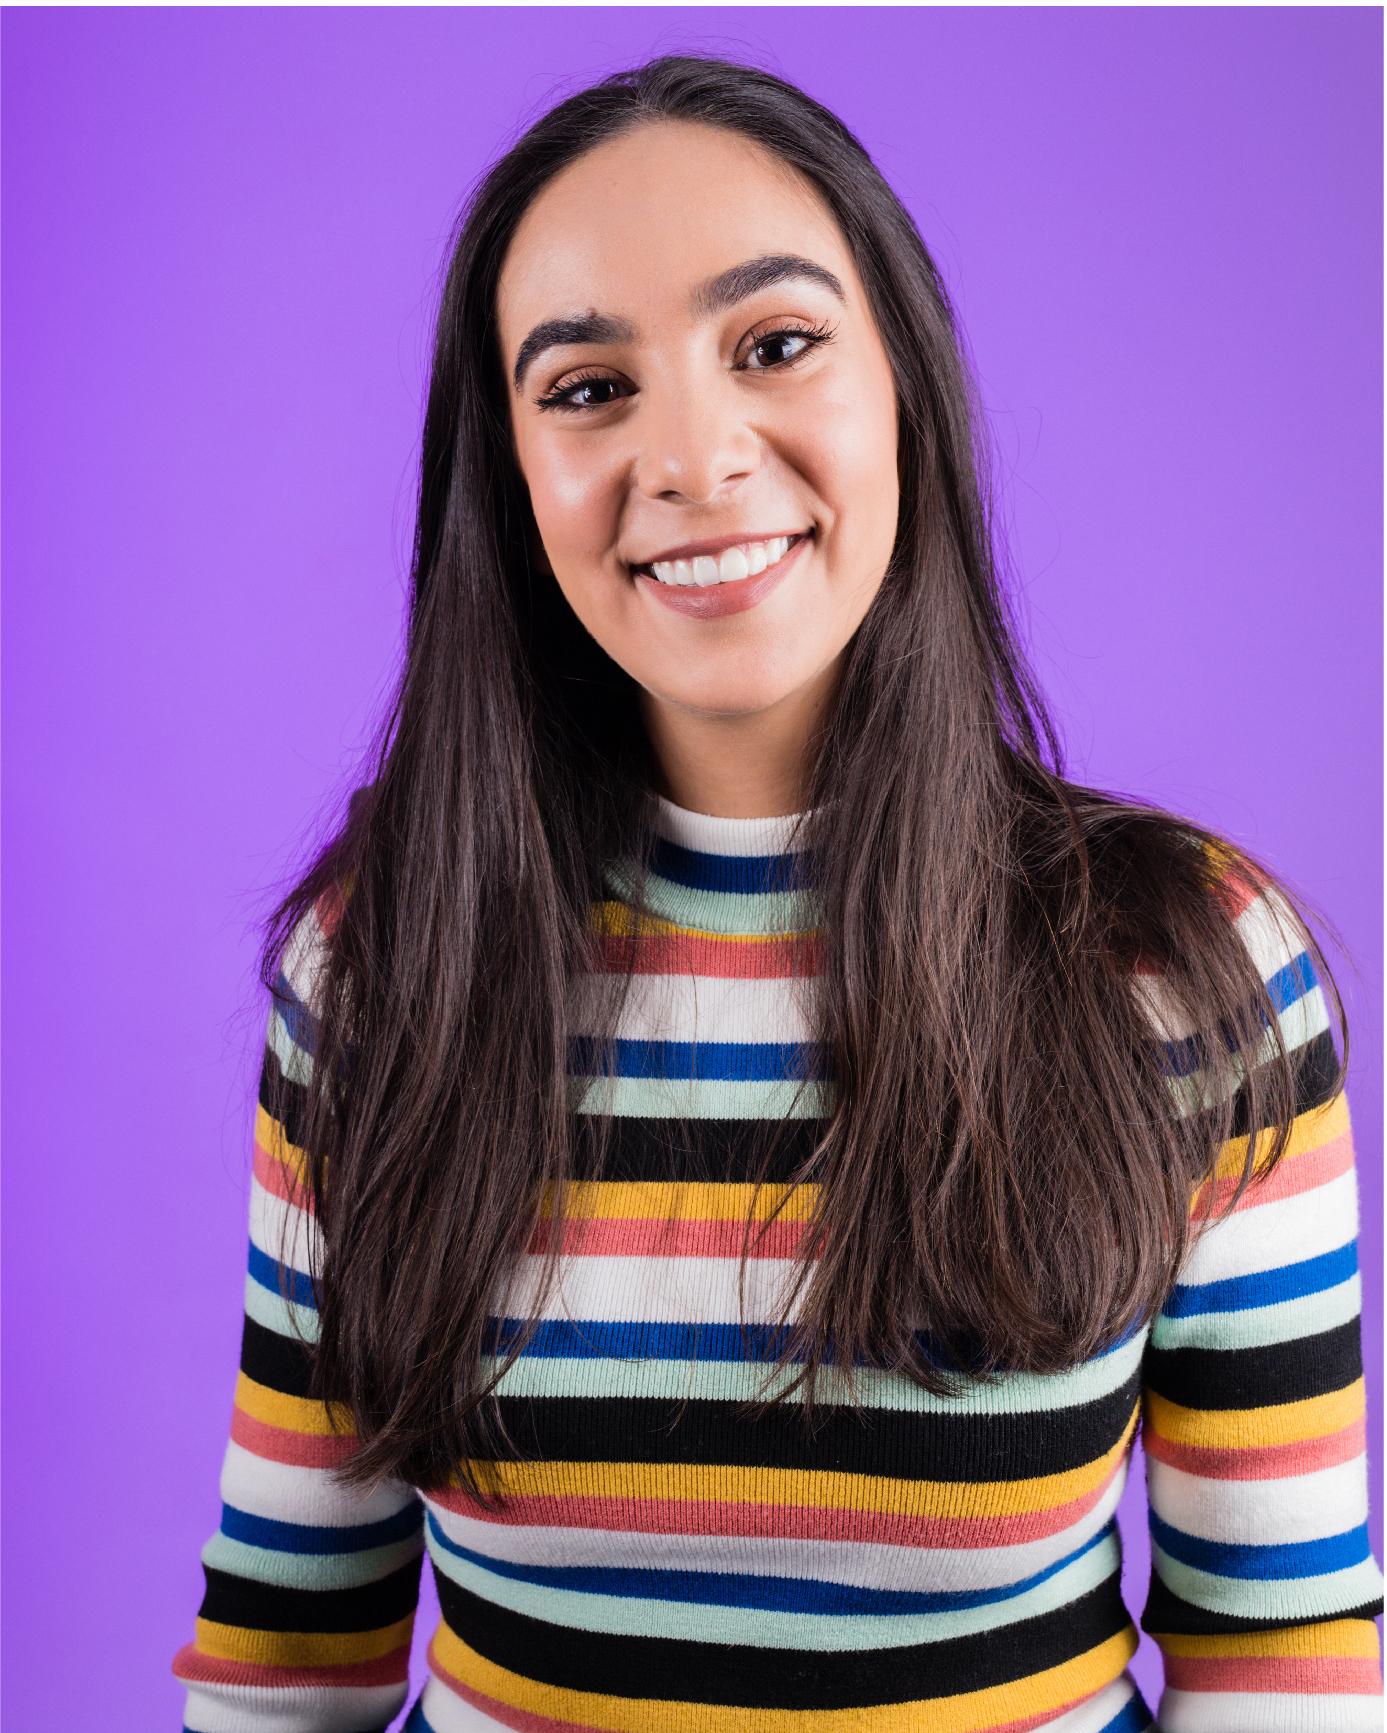 Camaleón - Laura Martínez